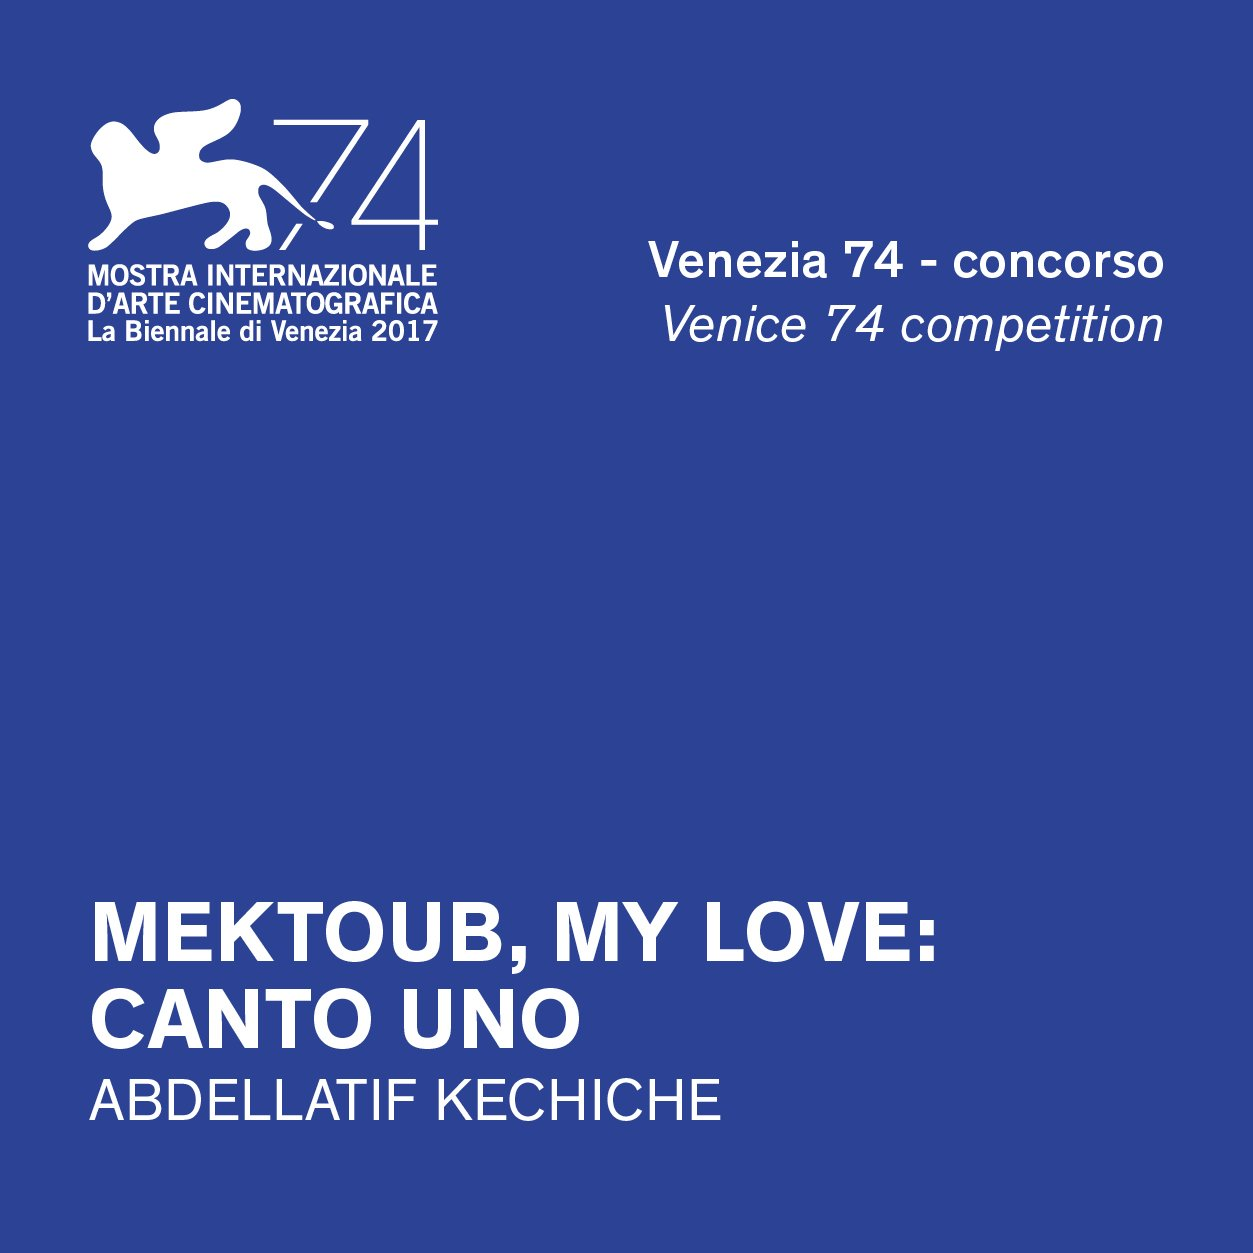 Festival de Veneza 2017 6/21